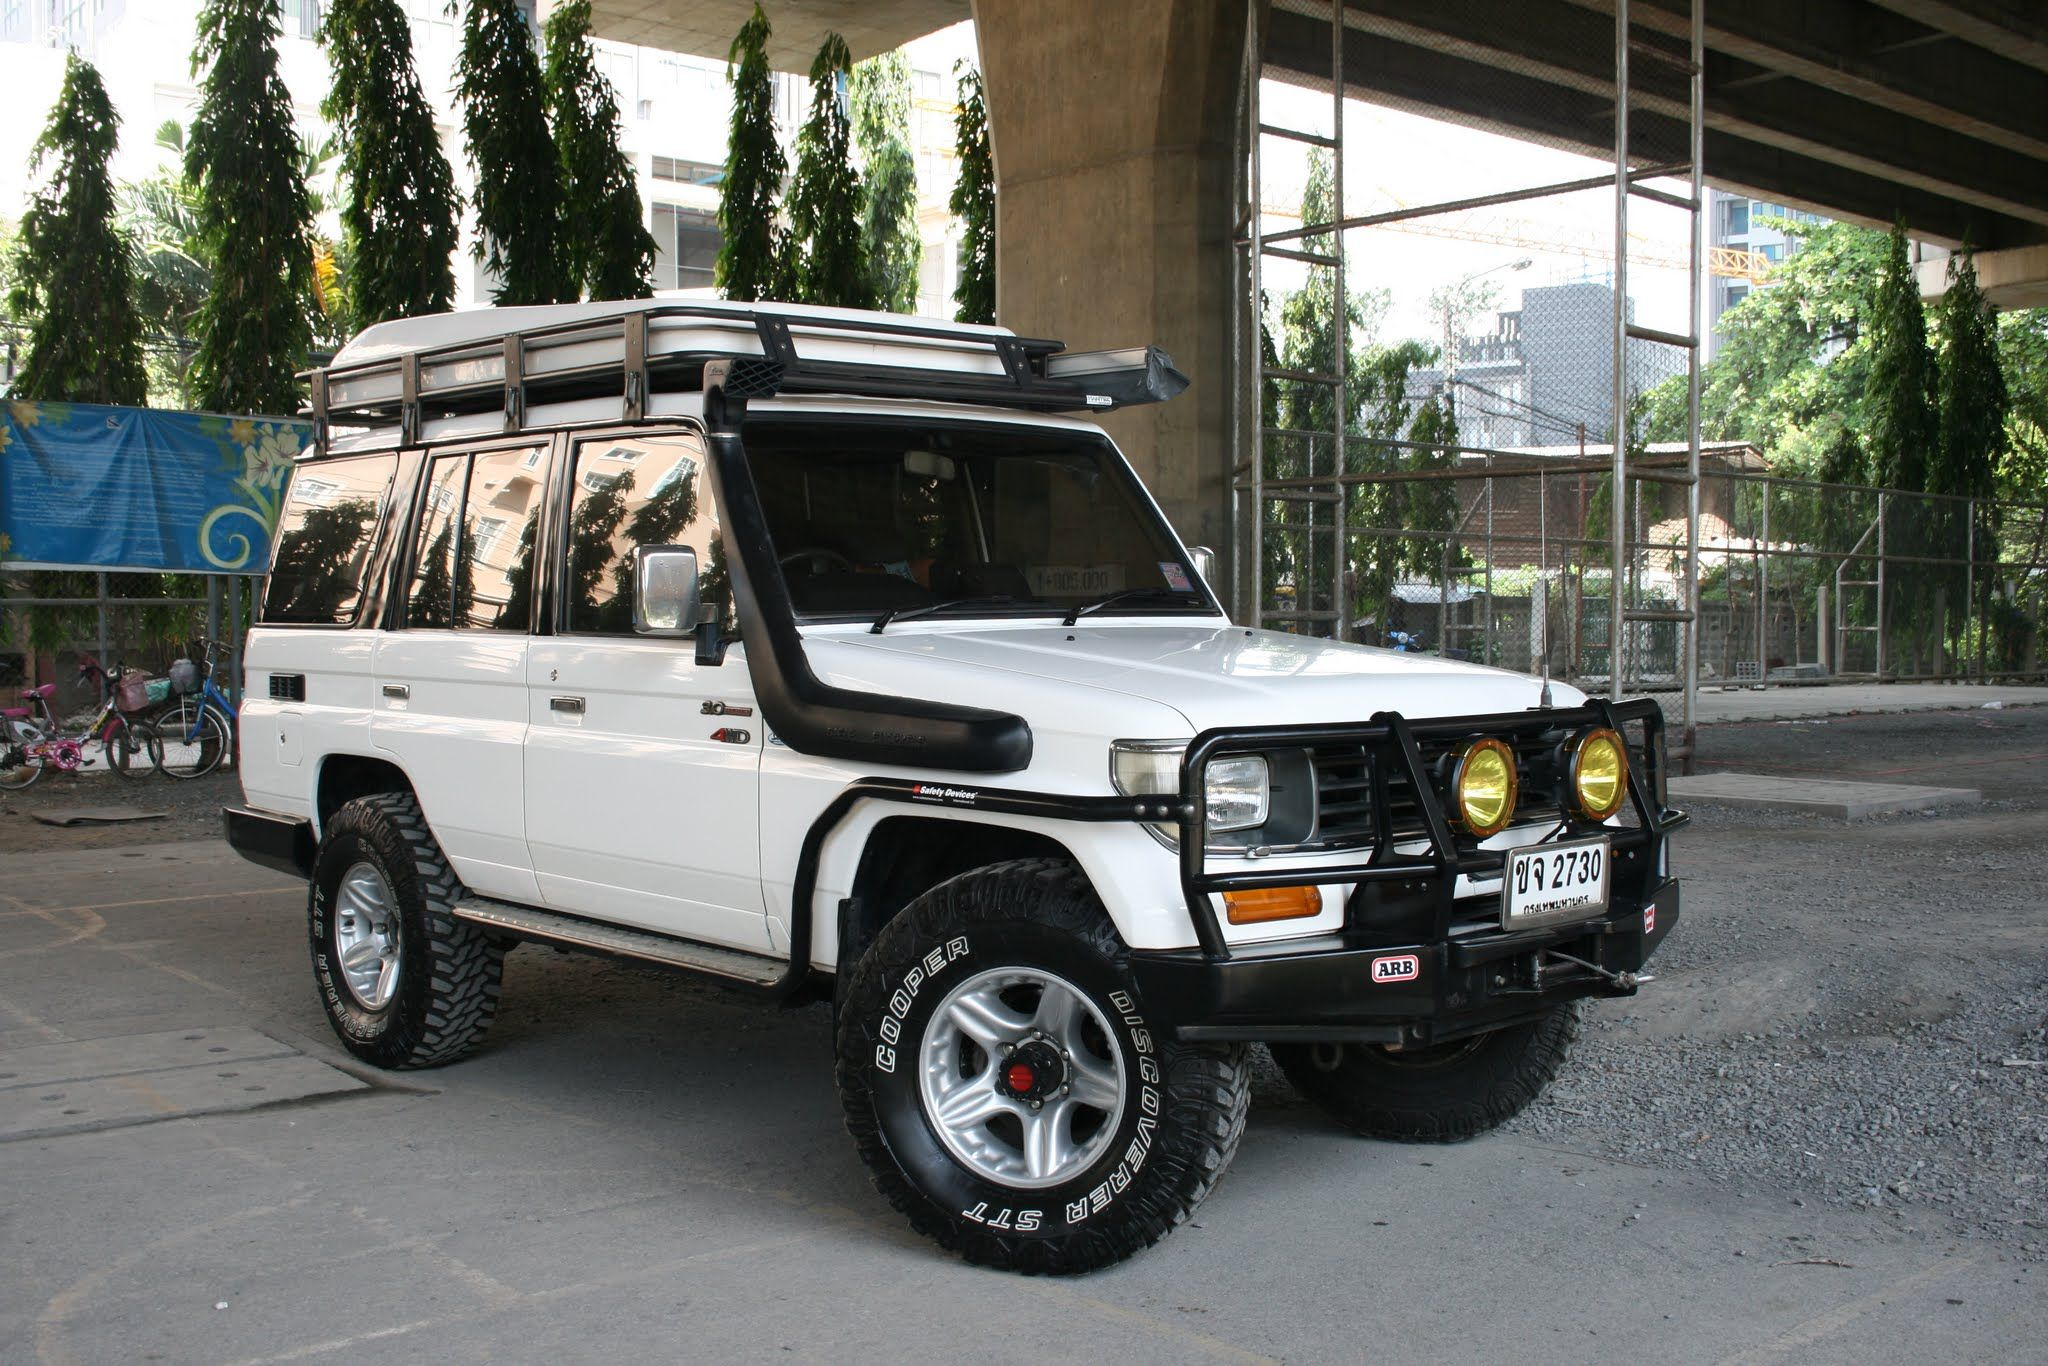 Toyota Land Cruiser LJ78 Expedition car 3000cc KZ turbo